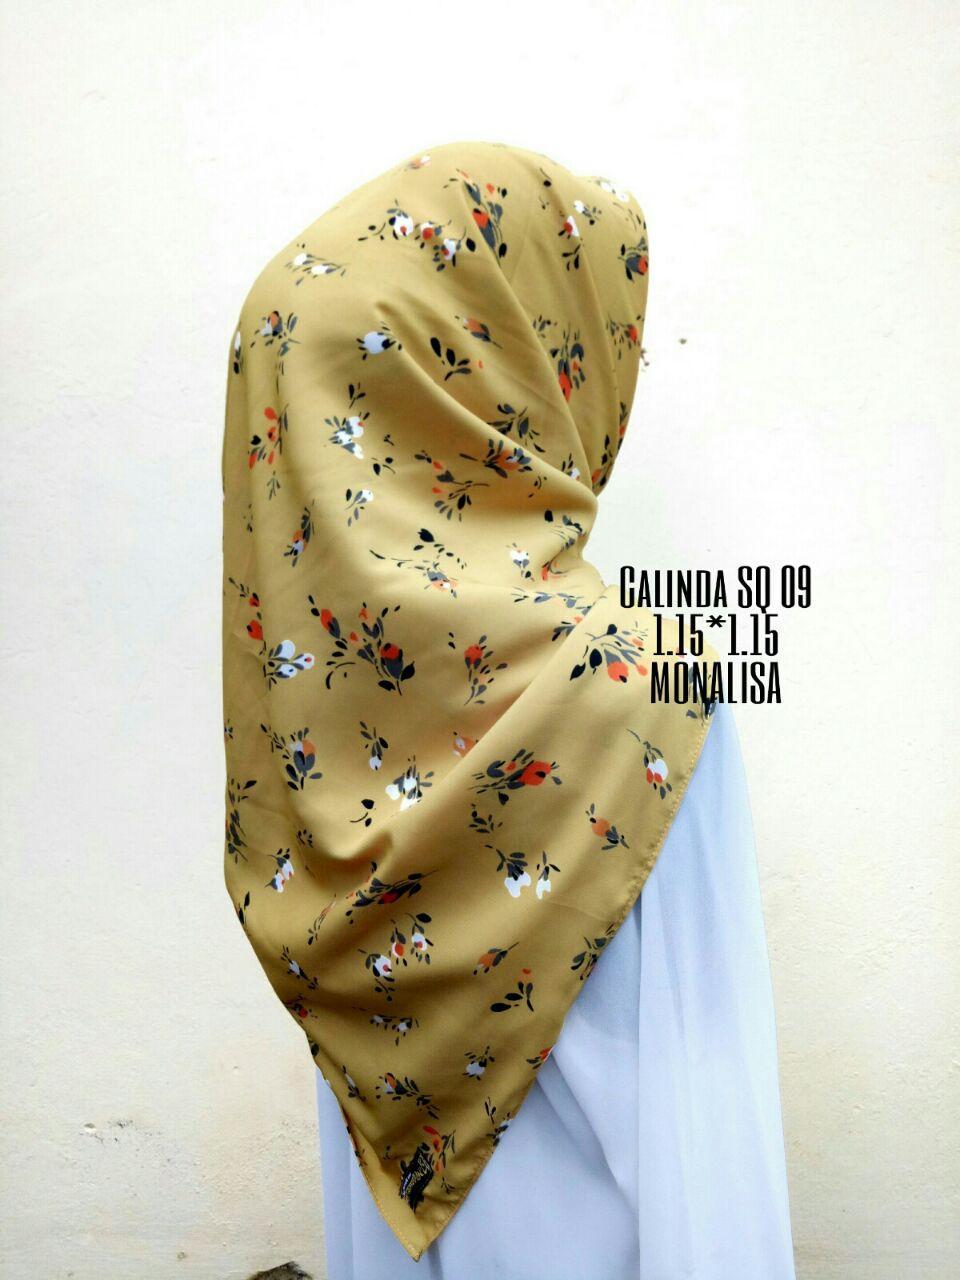 Calinda Mizu SQ Jilbab Keudung Segi Empat Bunga Kecil Hijab Segi Tiga Abstarak Pesta by Nggemesin Hijab